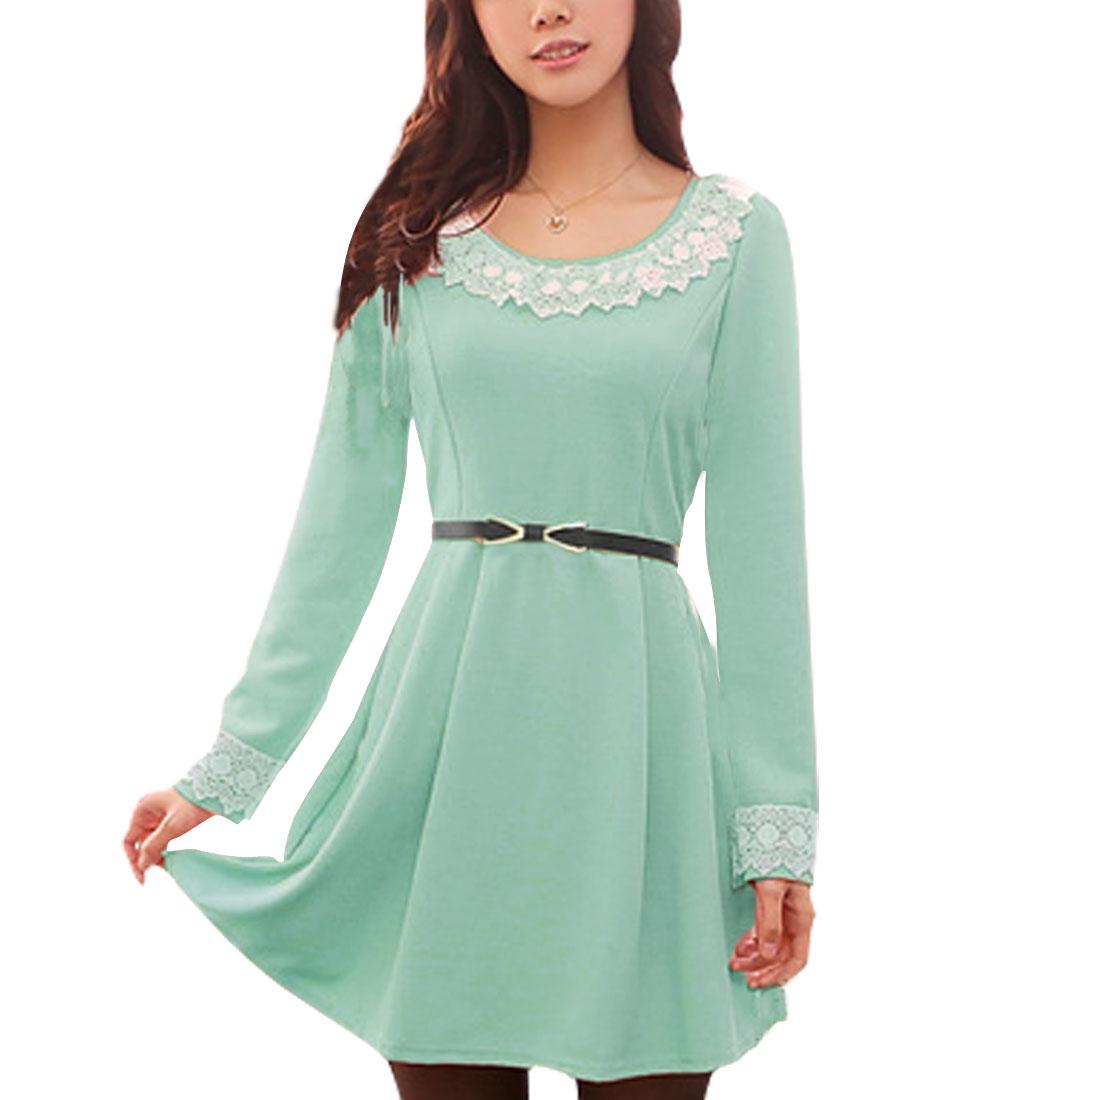 Ladies Light Green Peter Pan Collar Stretchy Pullover Mini Dress XS